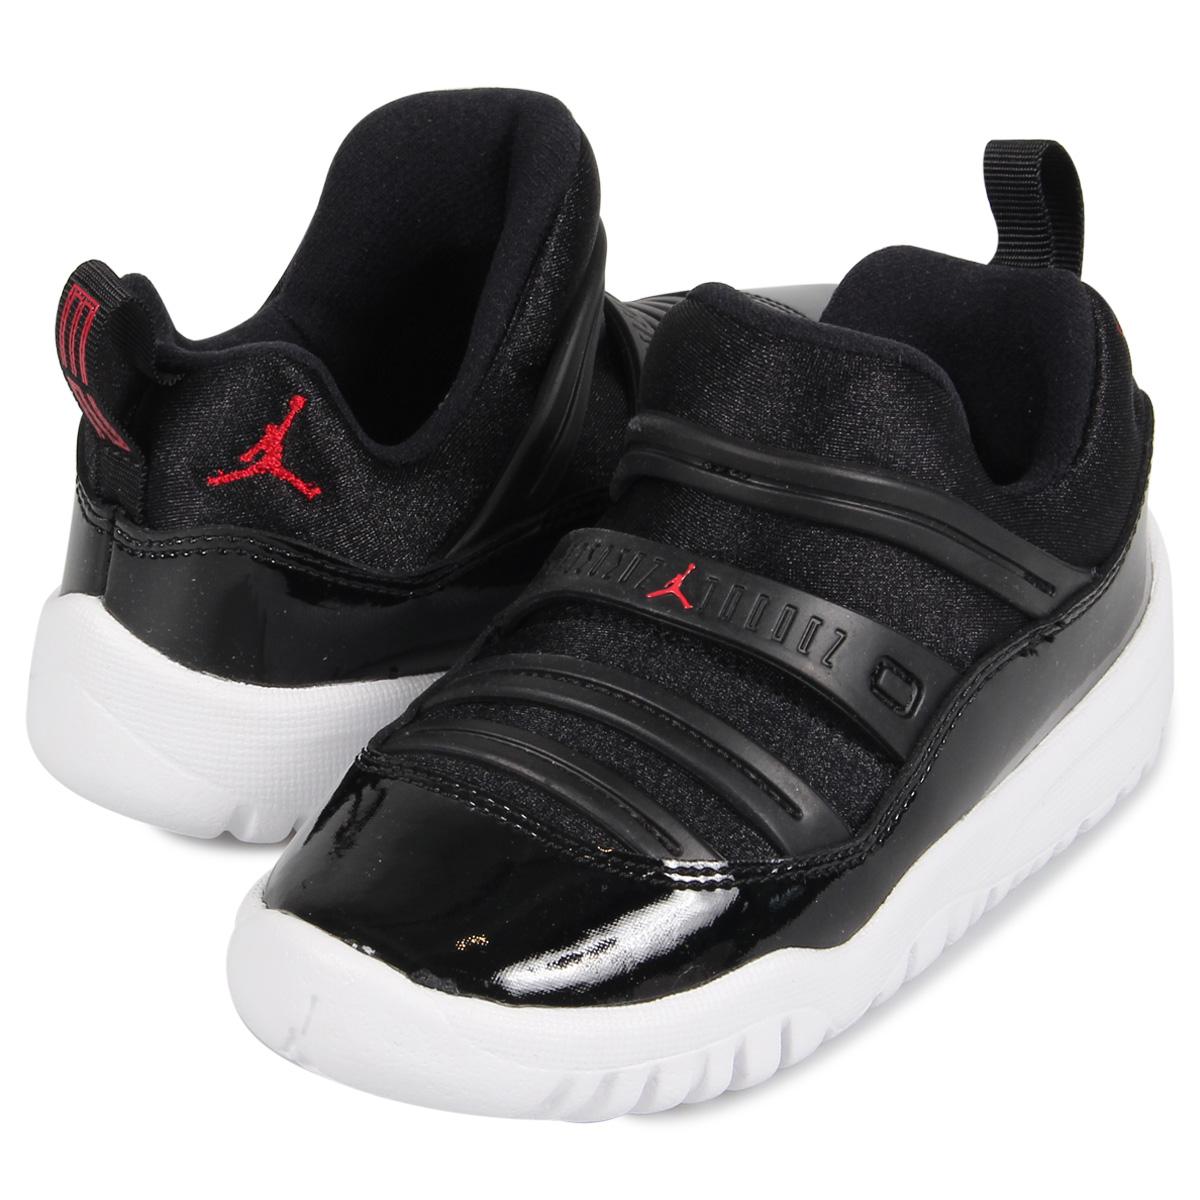 new style e8f10 4e366 Nike NIKE Air Jordan 11 nostalgic sneakers slip-ons baby kids AIR JORDAN 11  RETRO LITTLE FLEX TD black black BQ7102-002